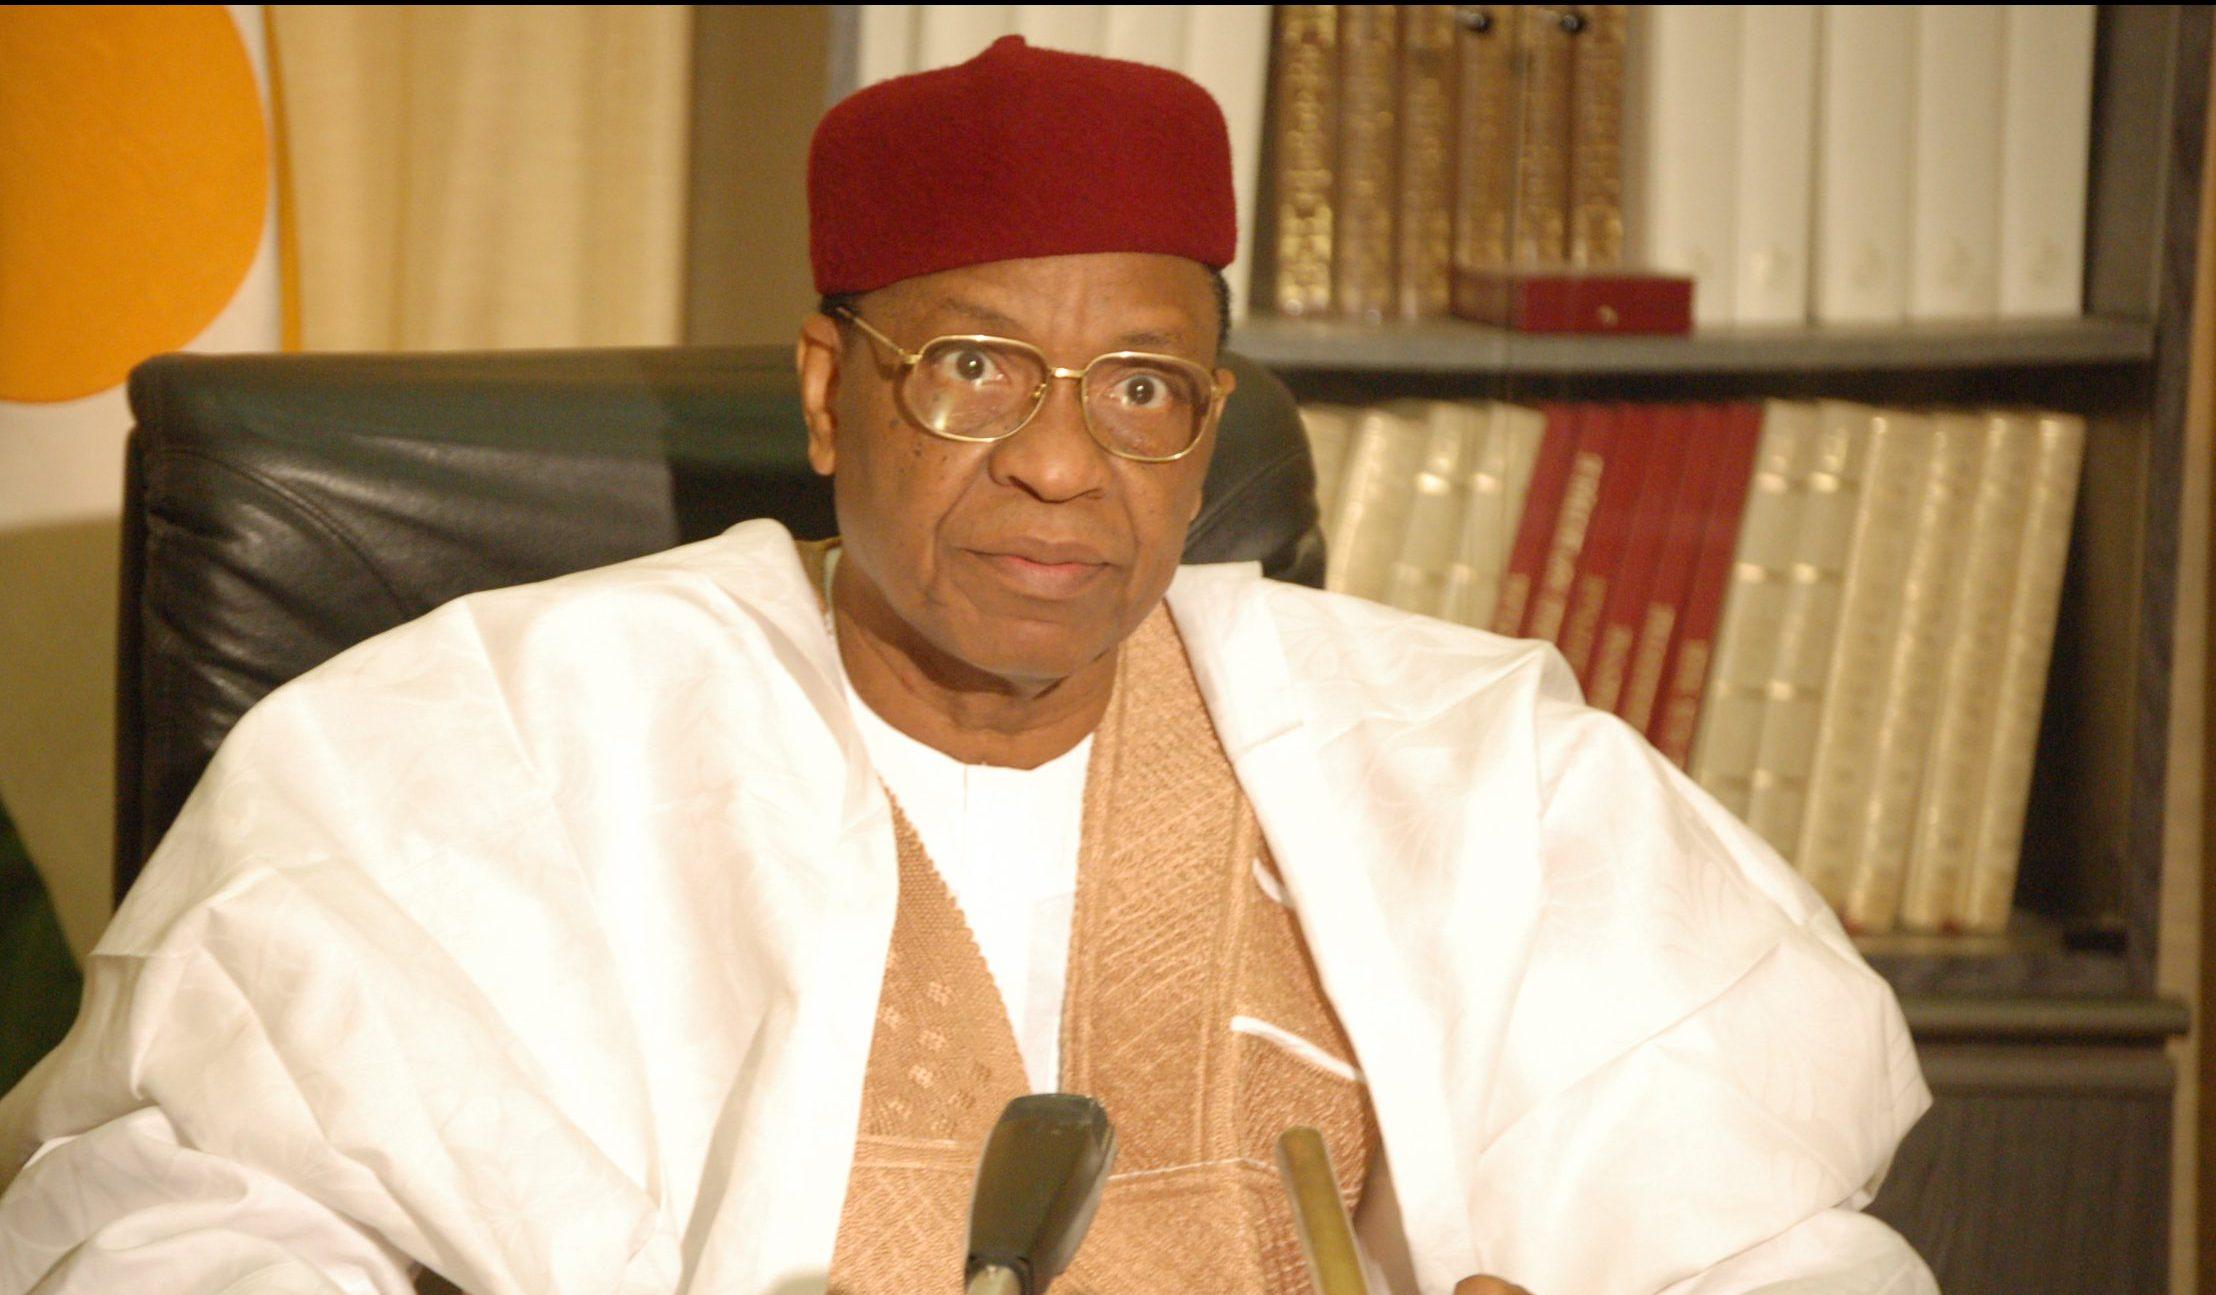 Former Niger president Mamadou Tandja dies aged 82 - Vanguard News